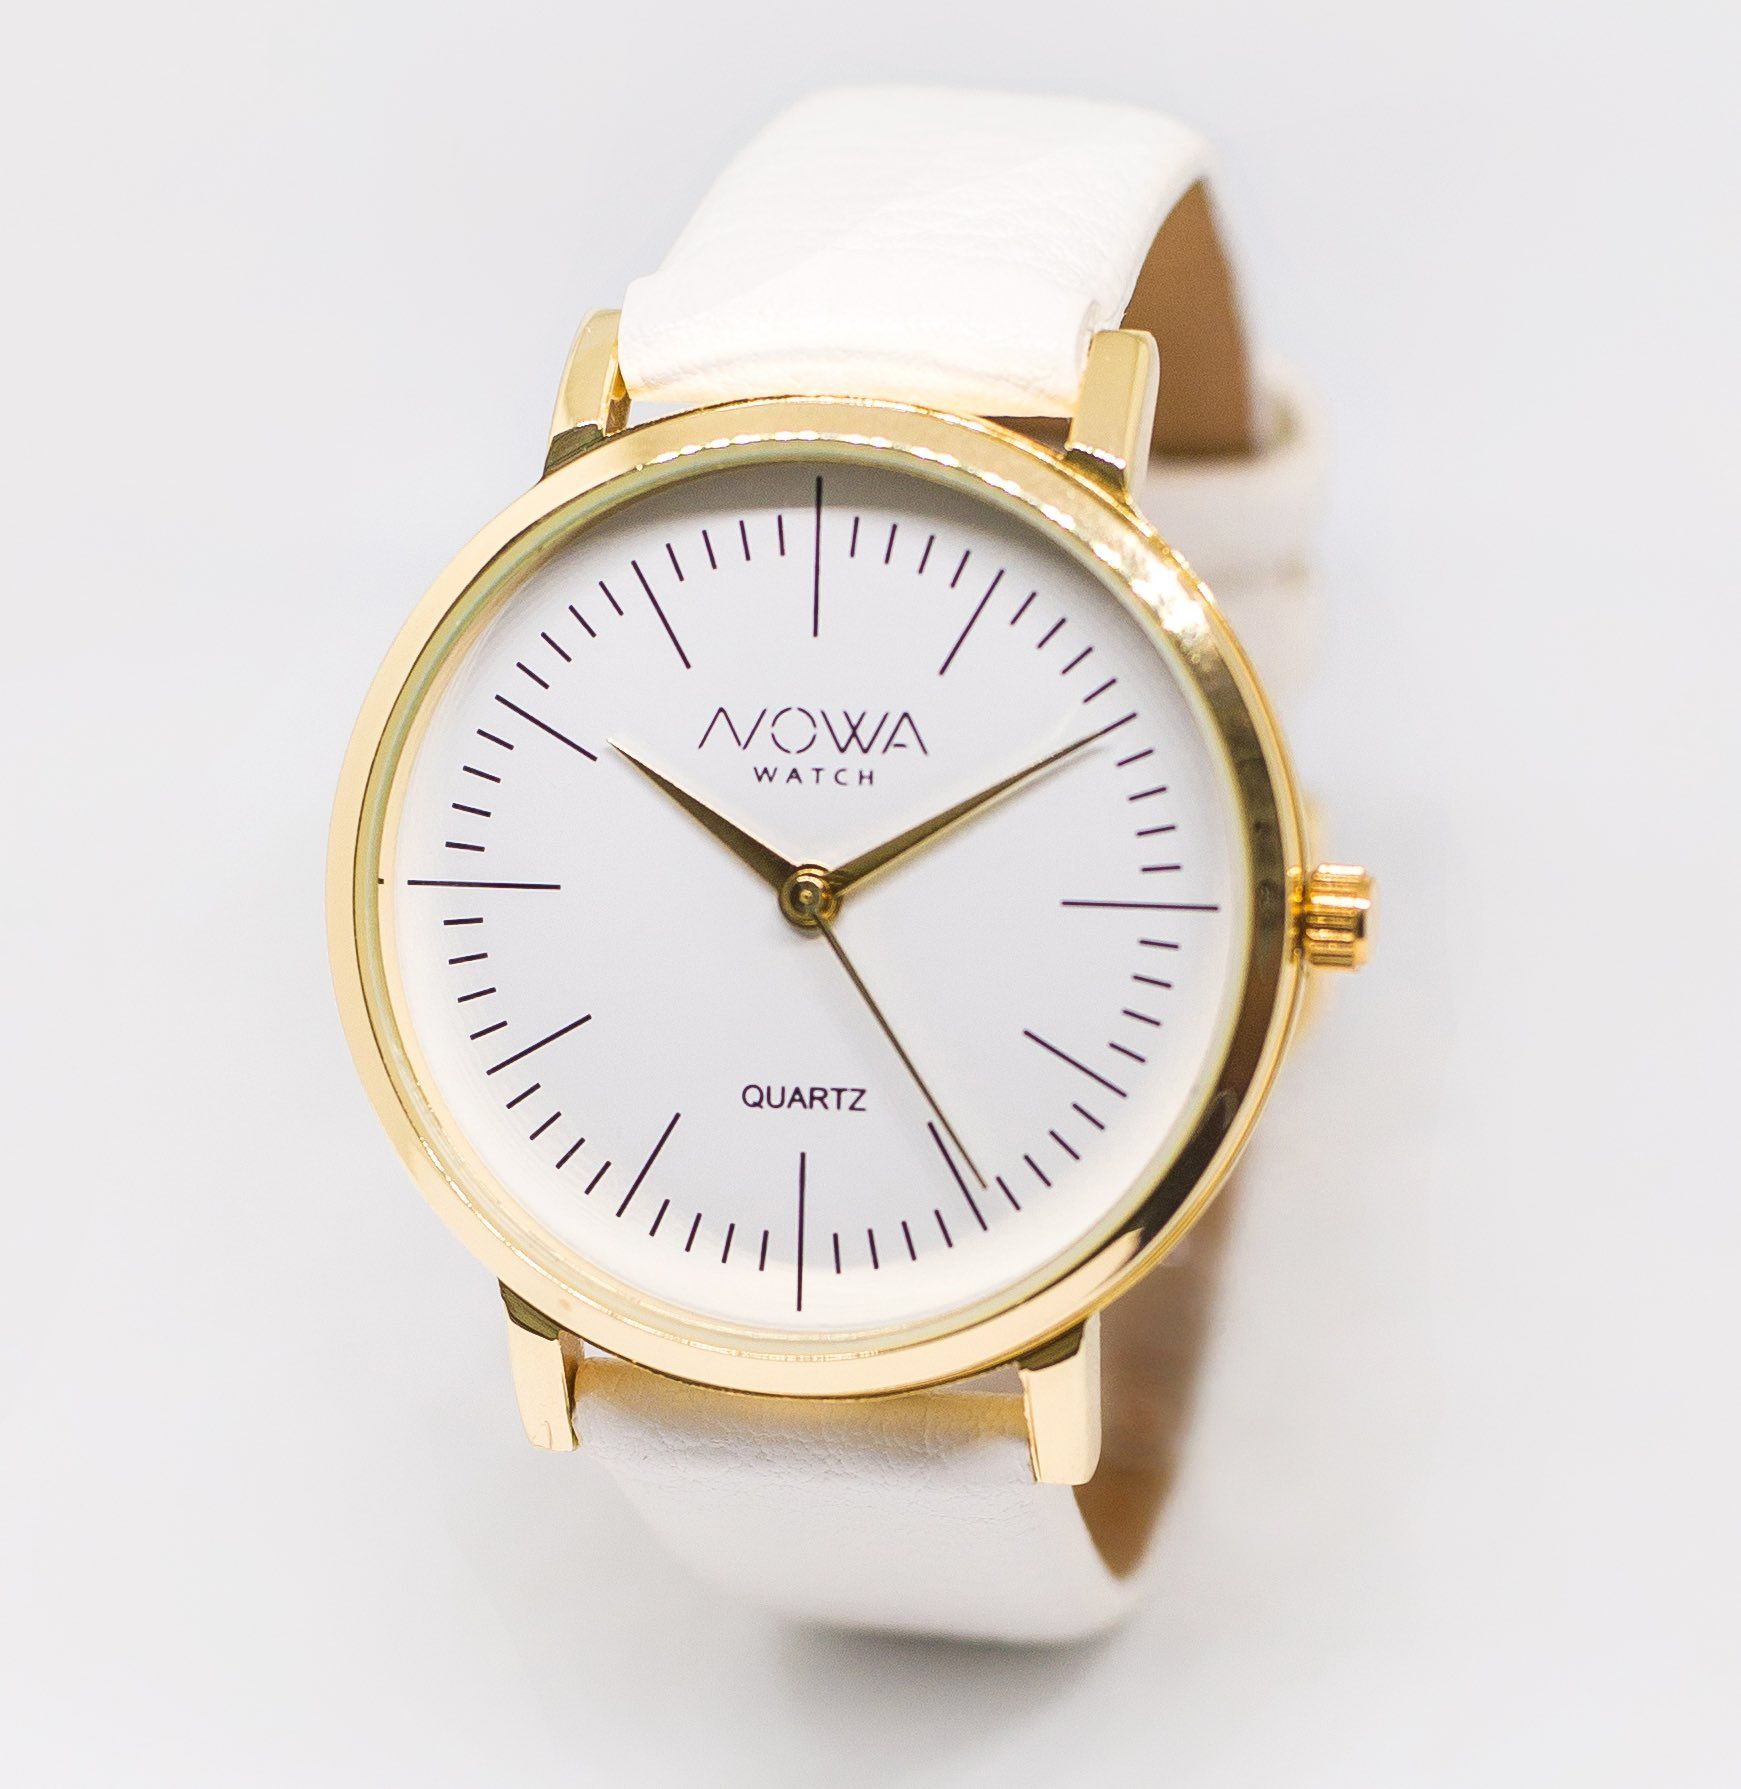 Relógio Nowa Feminino Dourado Couro Branco NW1407K